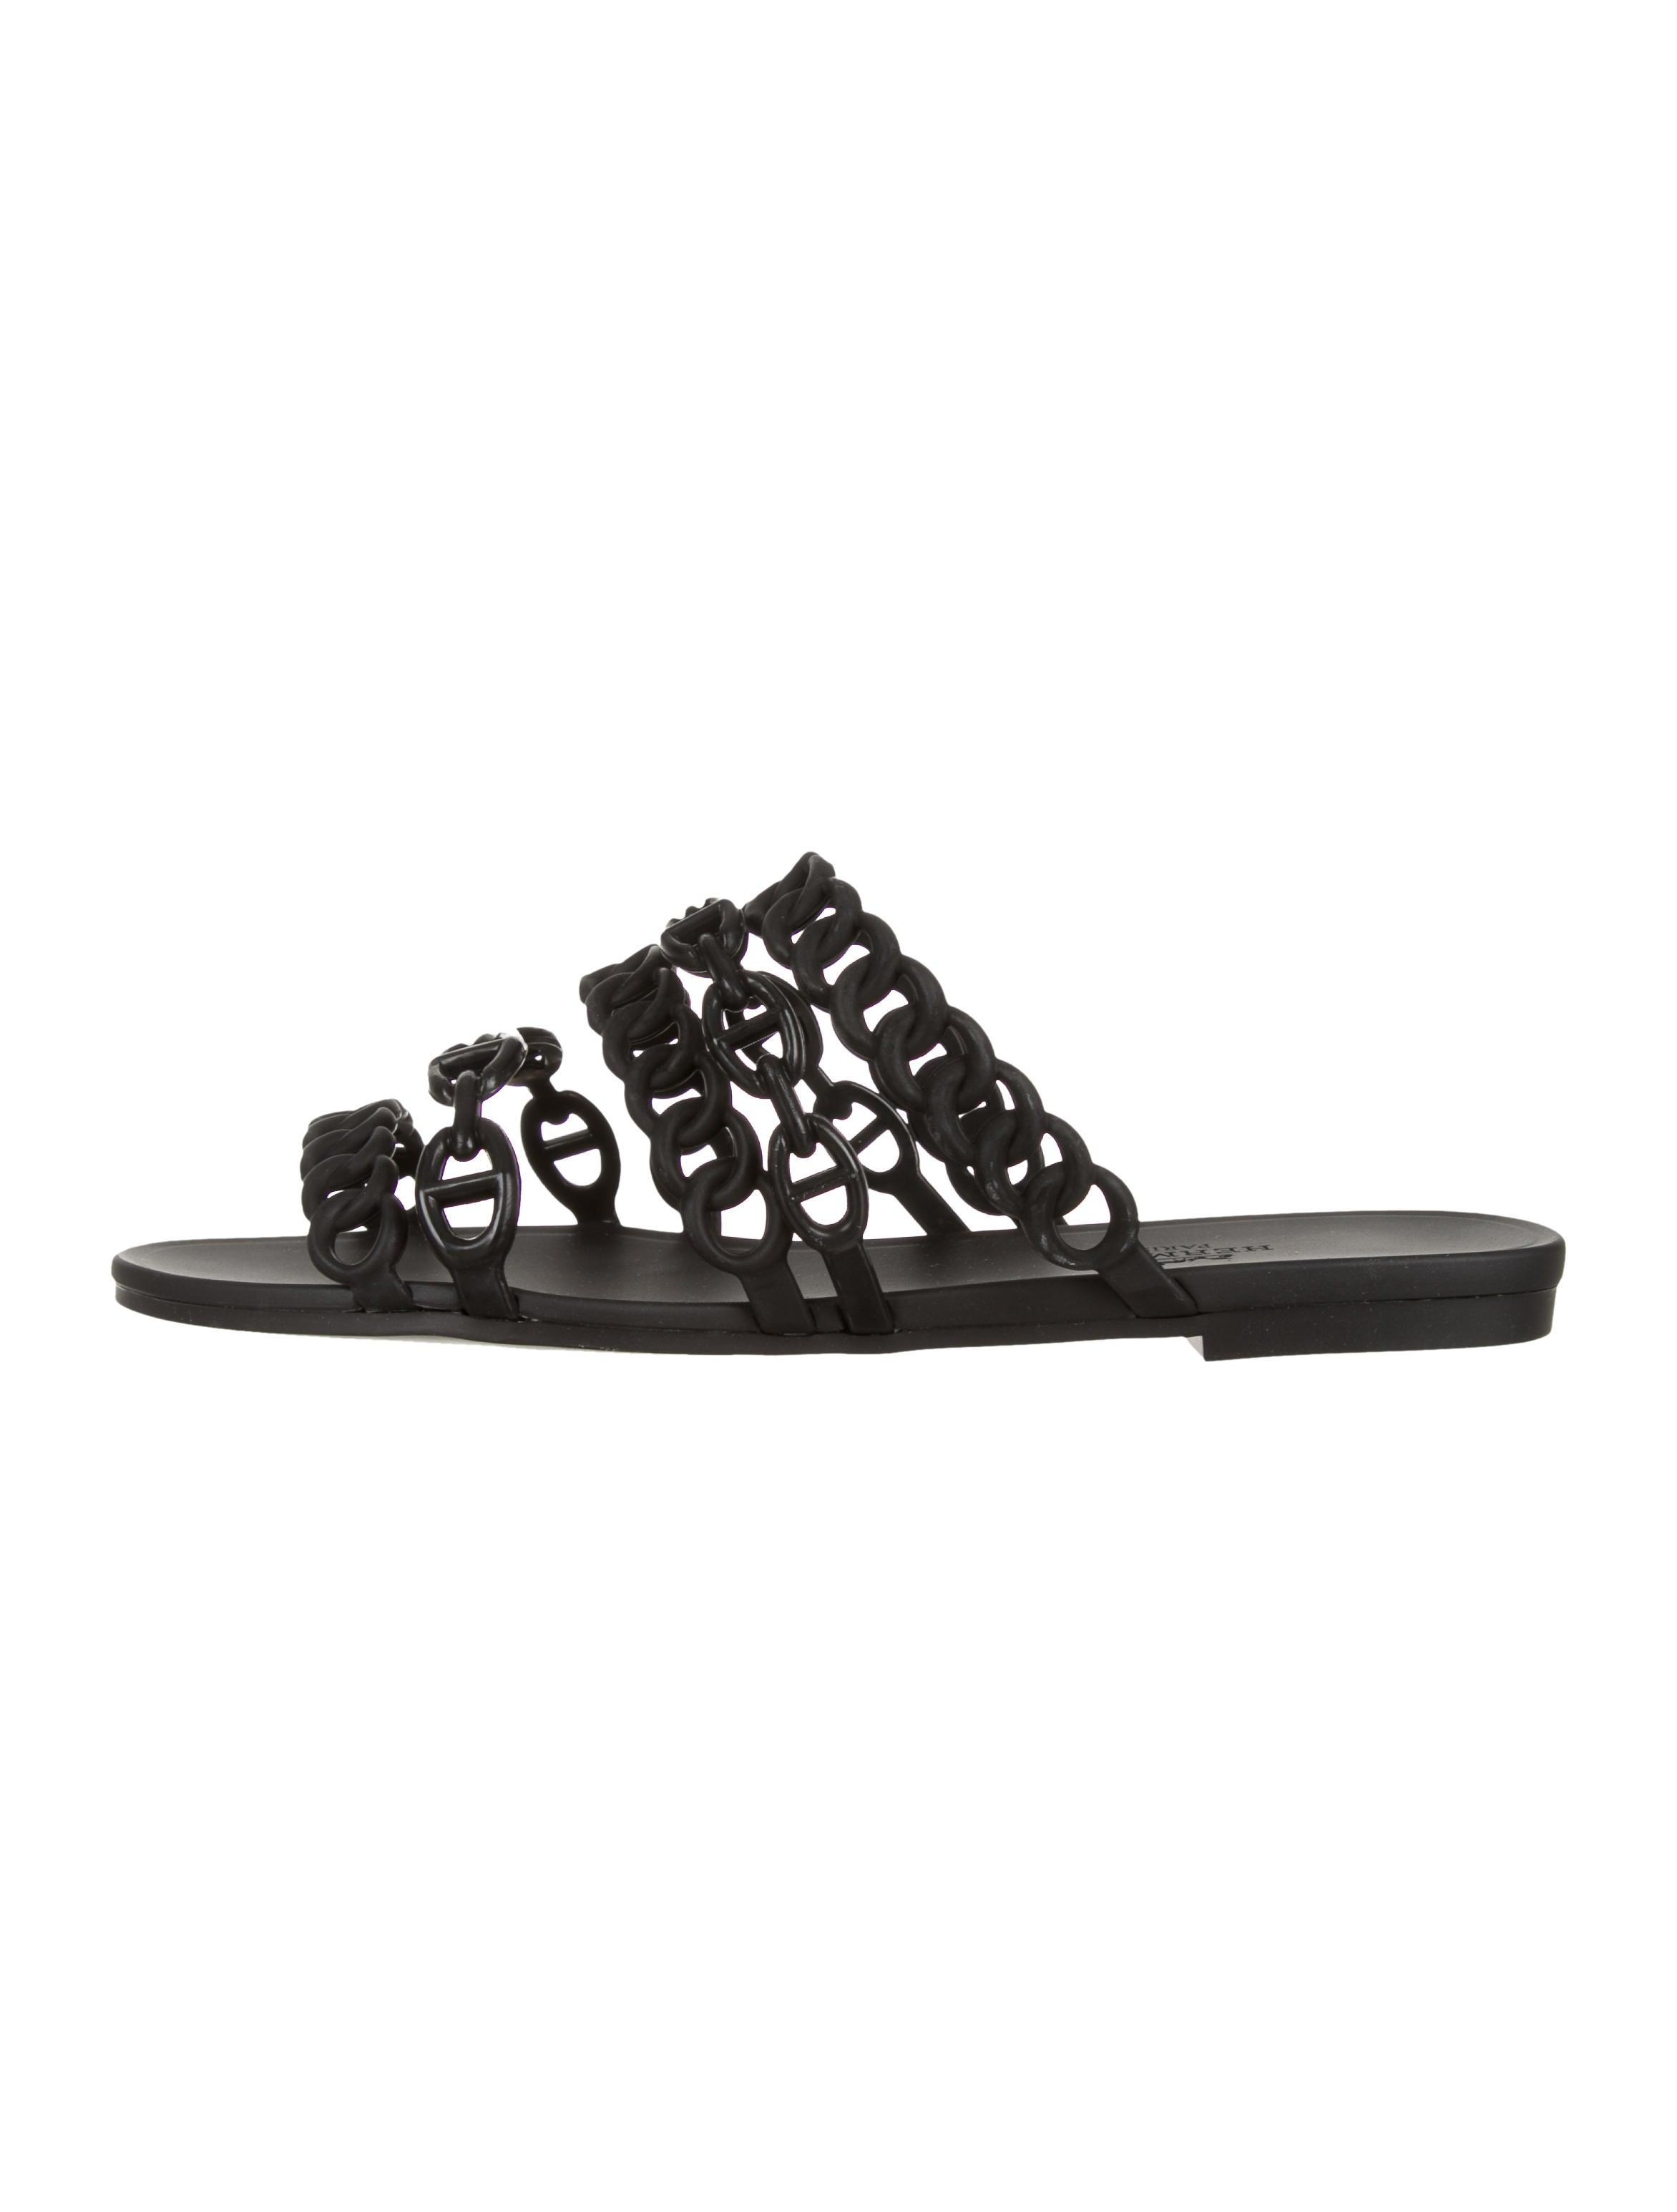 9ffe6a5a12f7 Hermès Chain D Ancre Slide Sandals - Shoes - HER159075